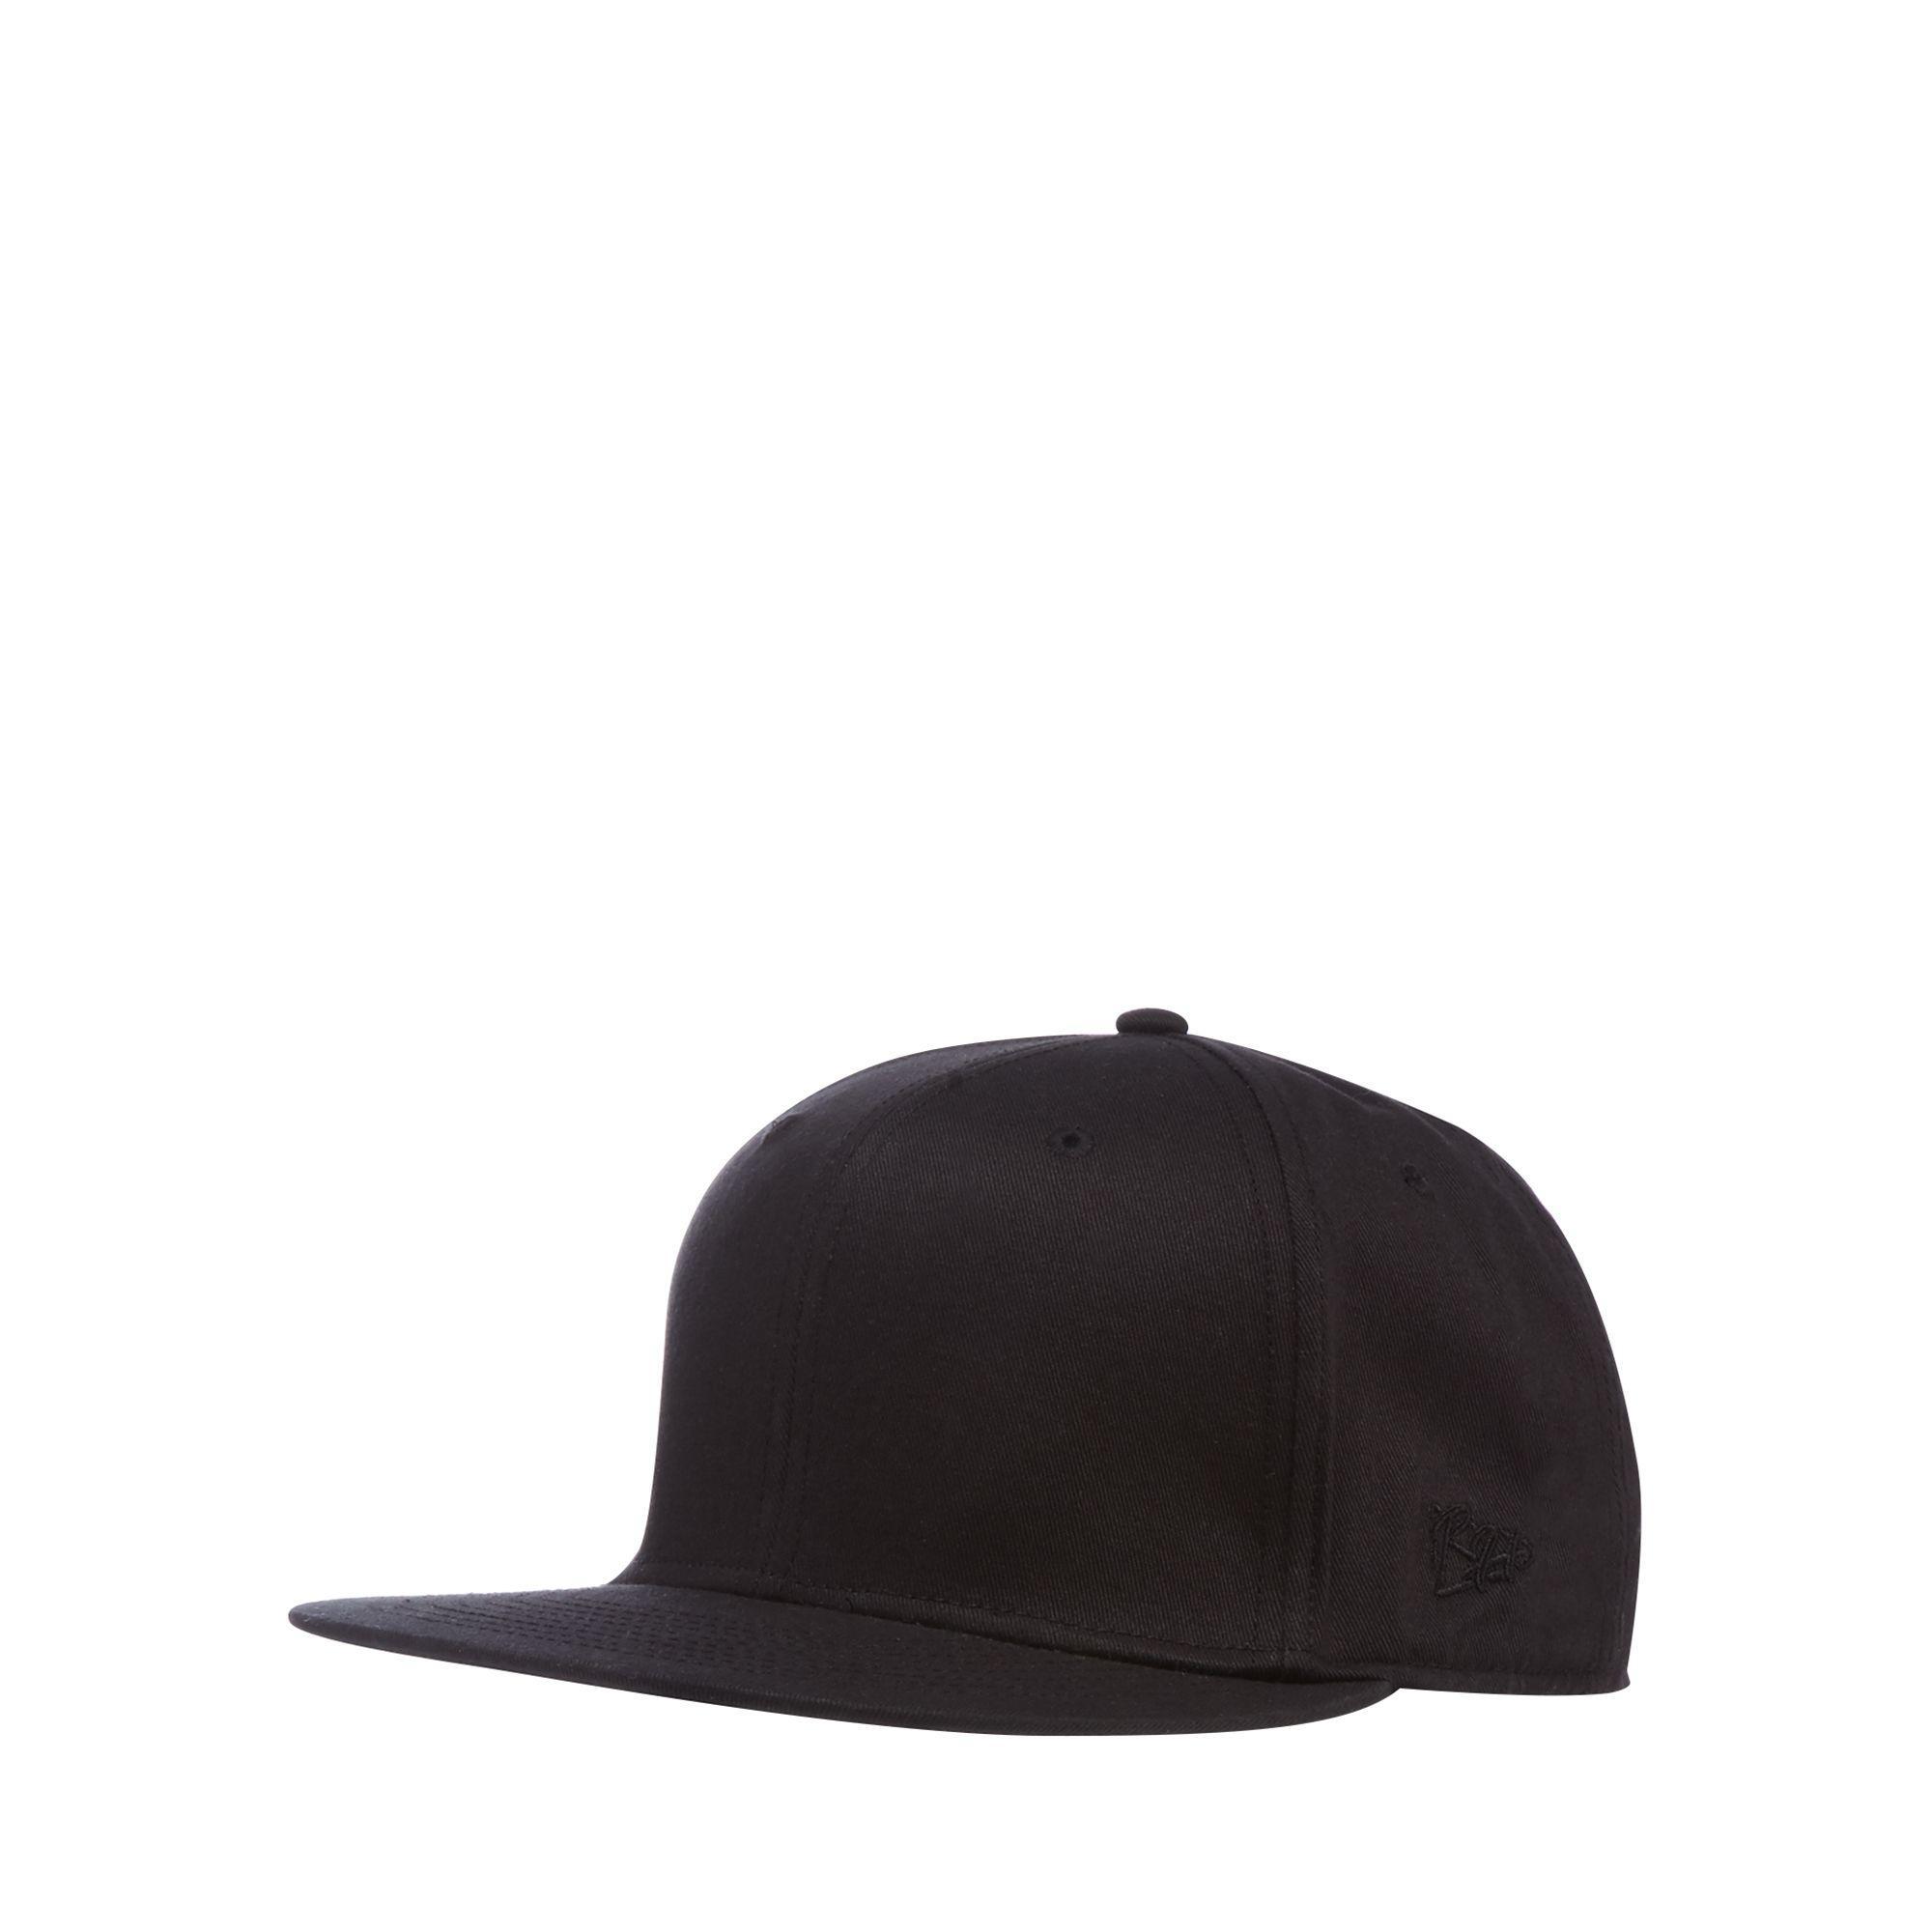 1365deac68d Red Herring Black Baseball Hat in Black for Men - Lyst